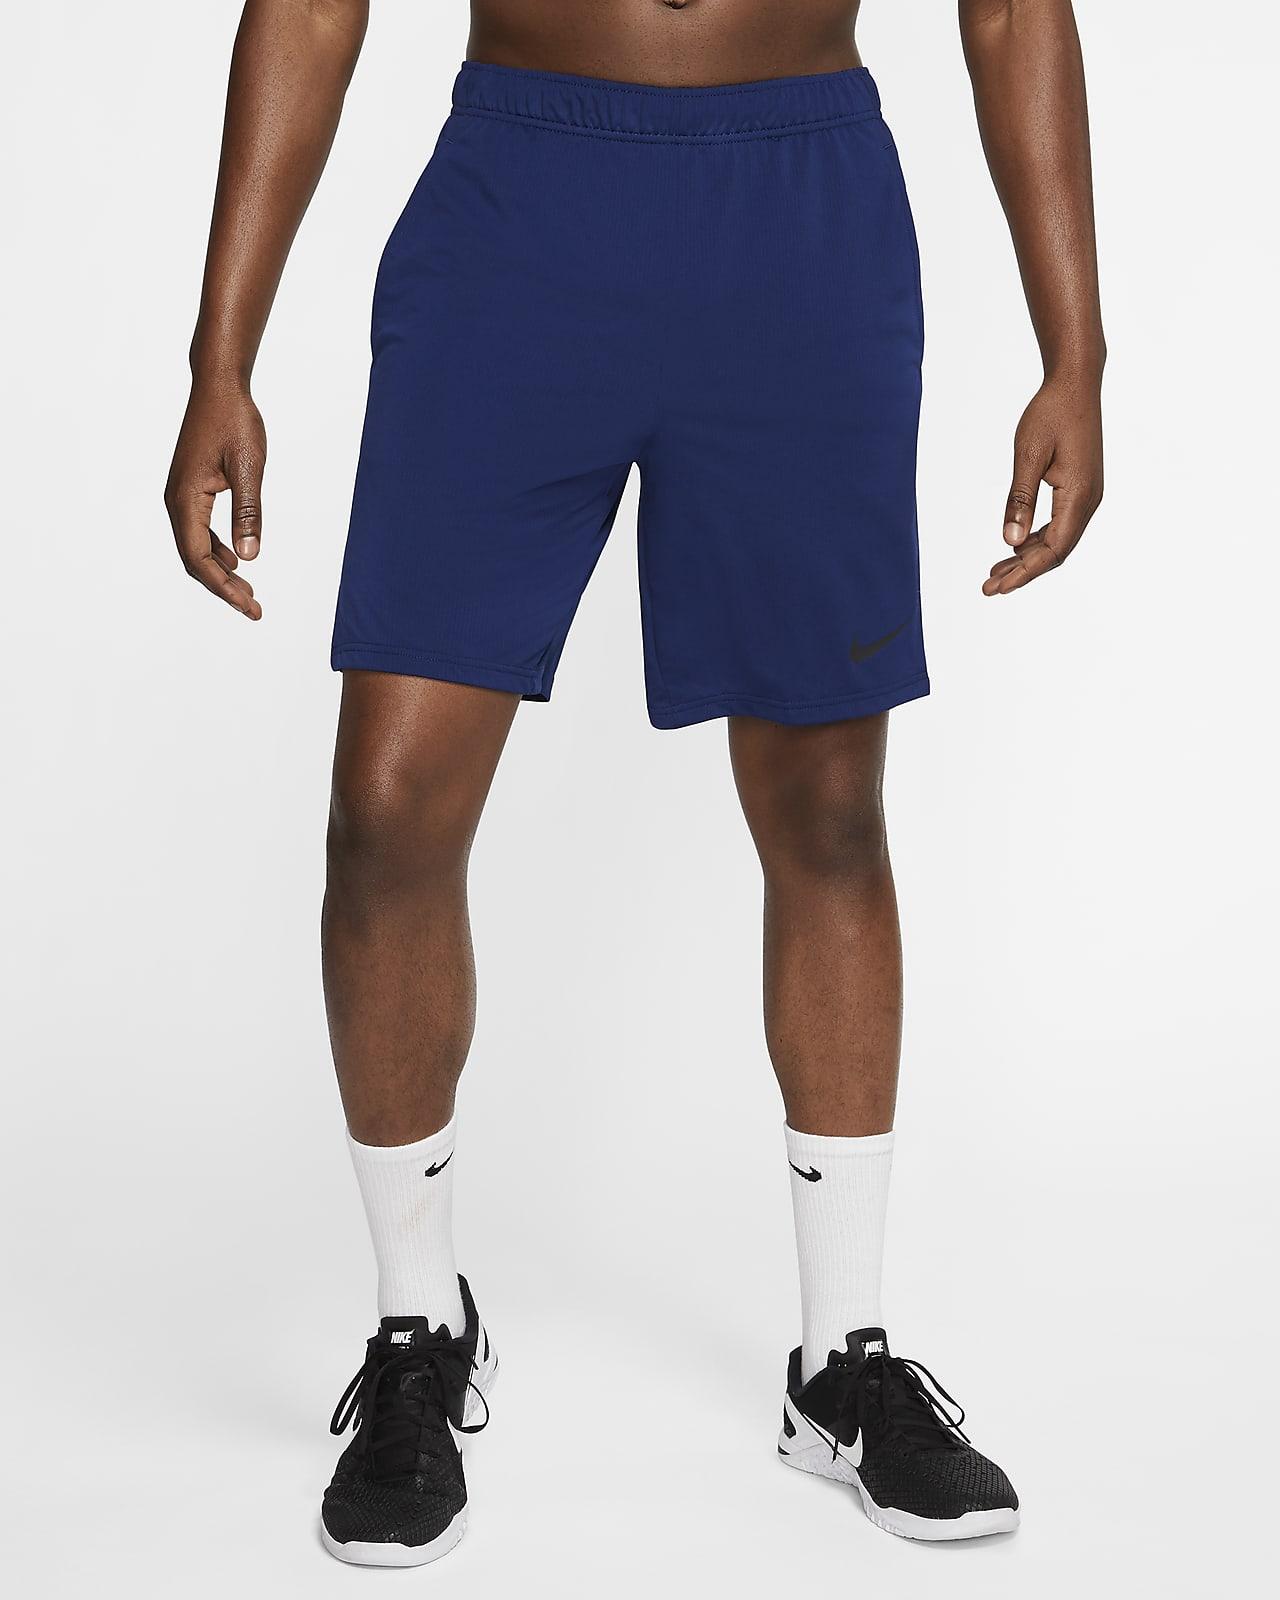 pulmón aniversario por ejemplo  Nike Dri-FIT Men's Training Shorts. Nike.com